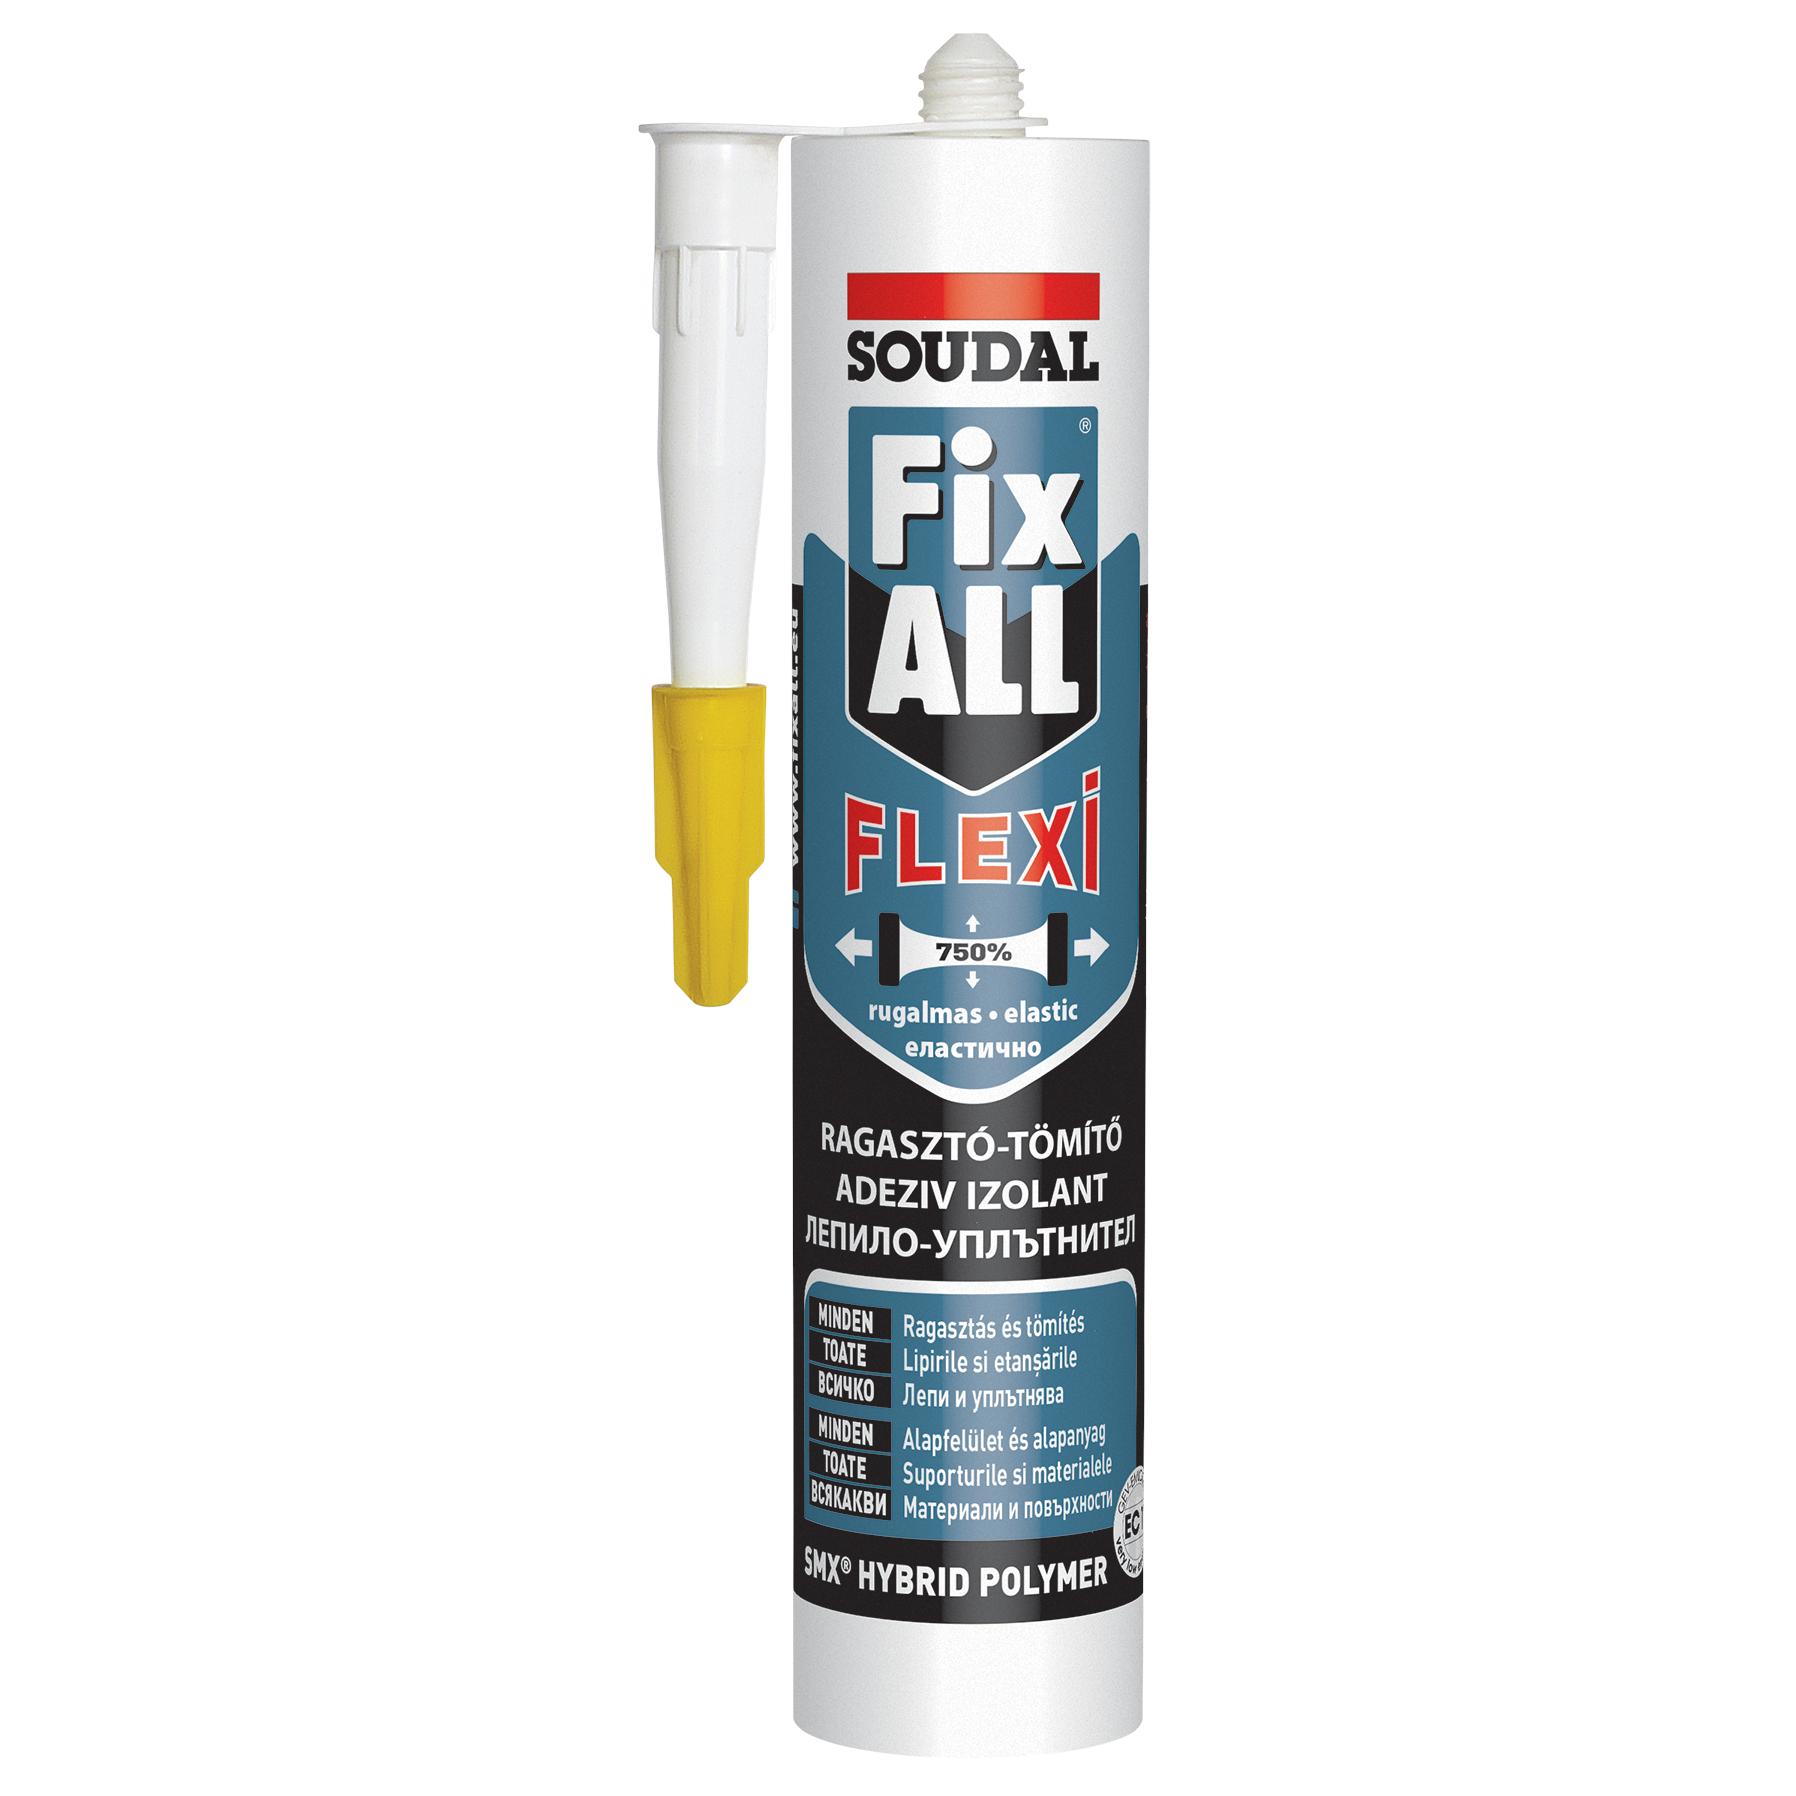 Adeziv Soudal Fix All Flexi, Gri, 290 ml imagine MatHaus